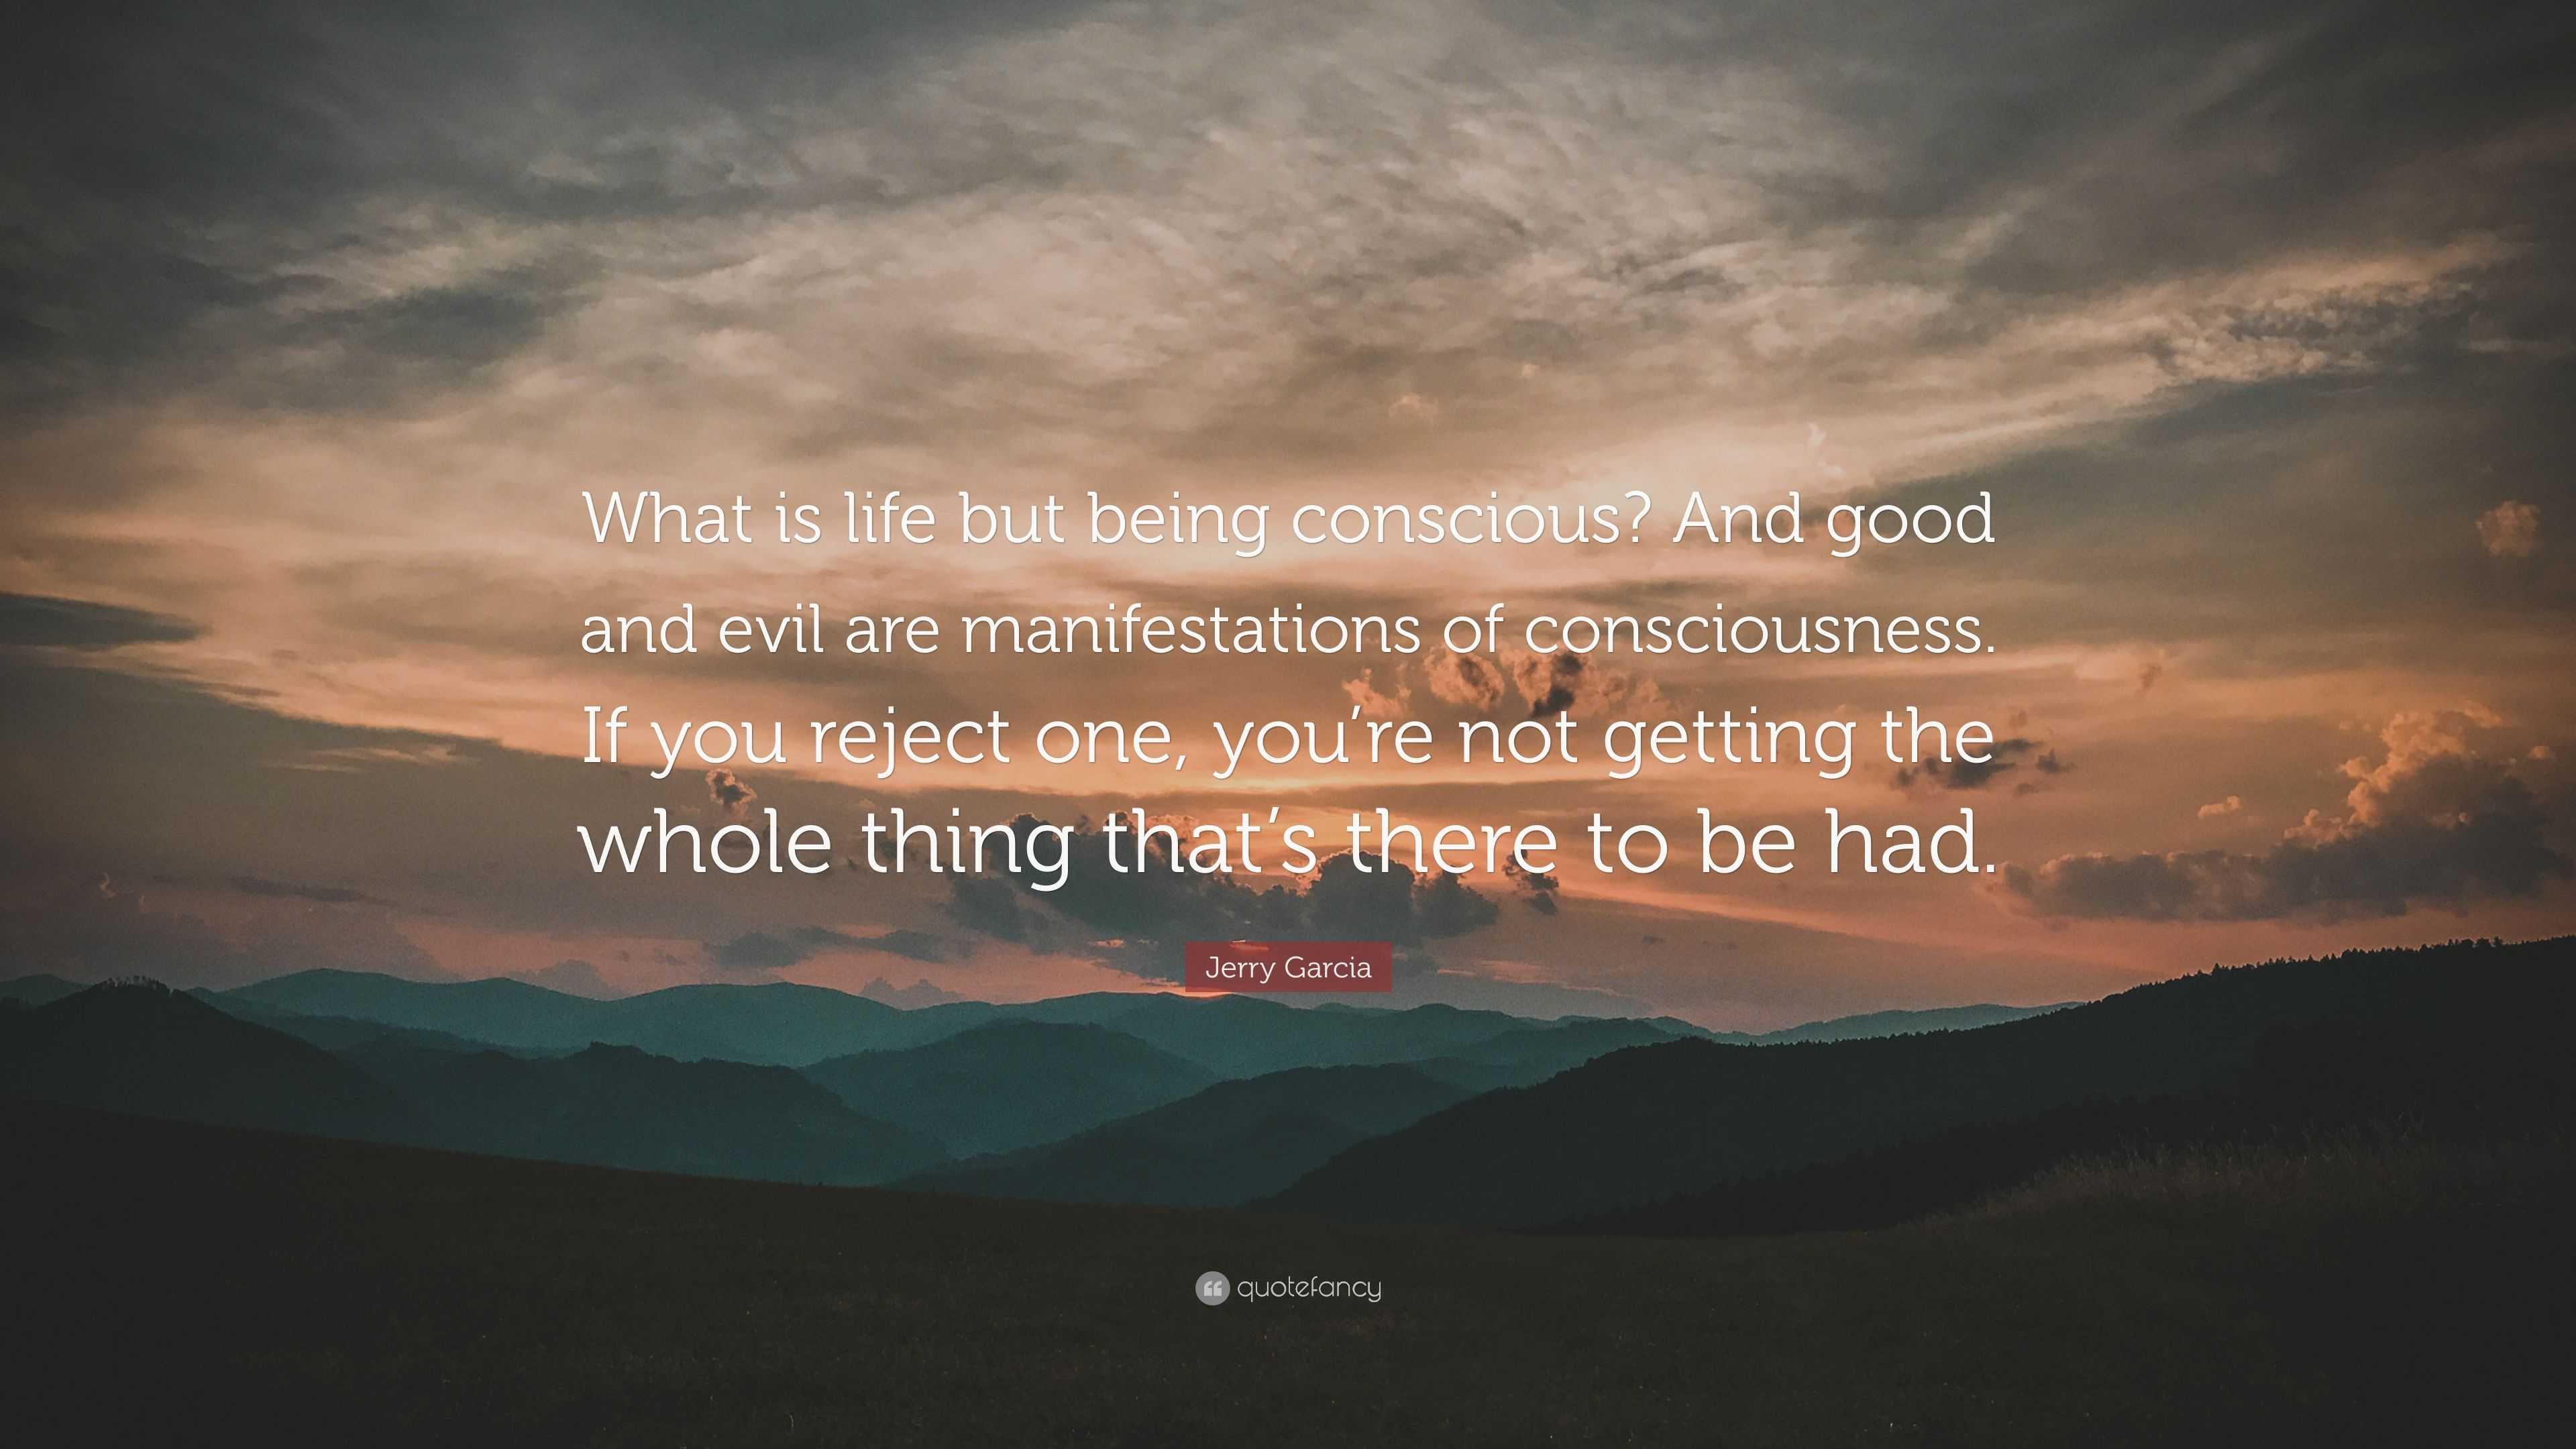 Conscious Quotes Magnificent New Good Conscious Life Quotes